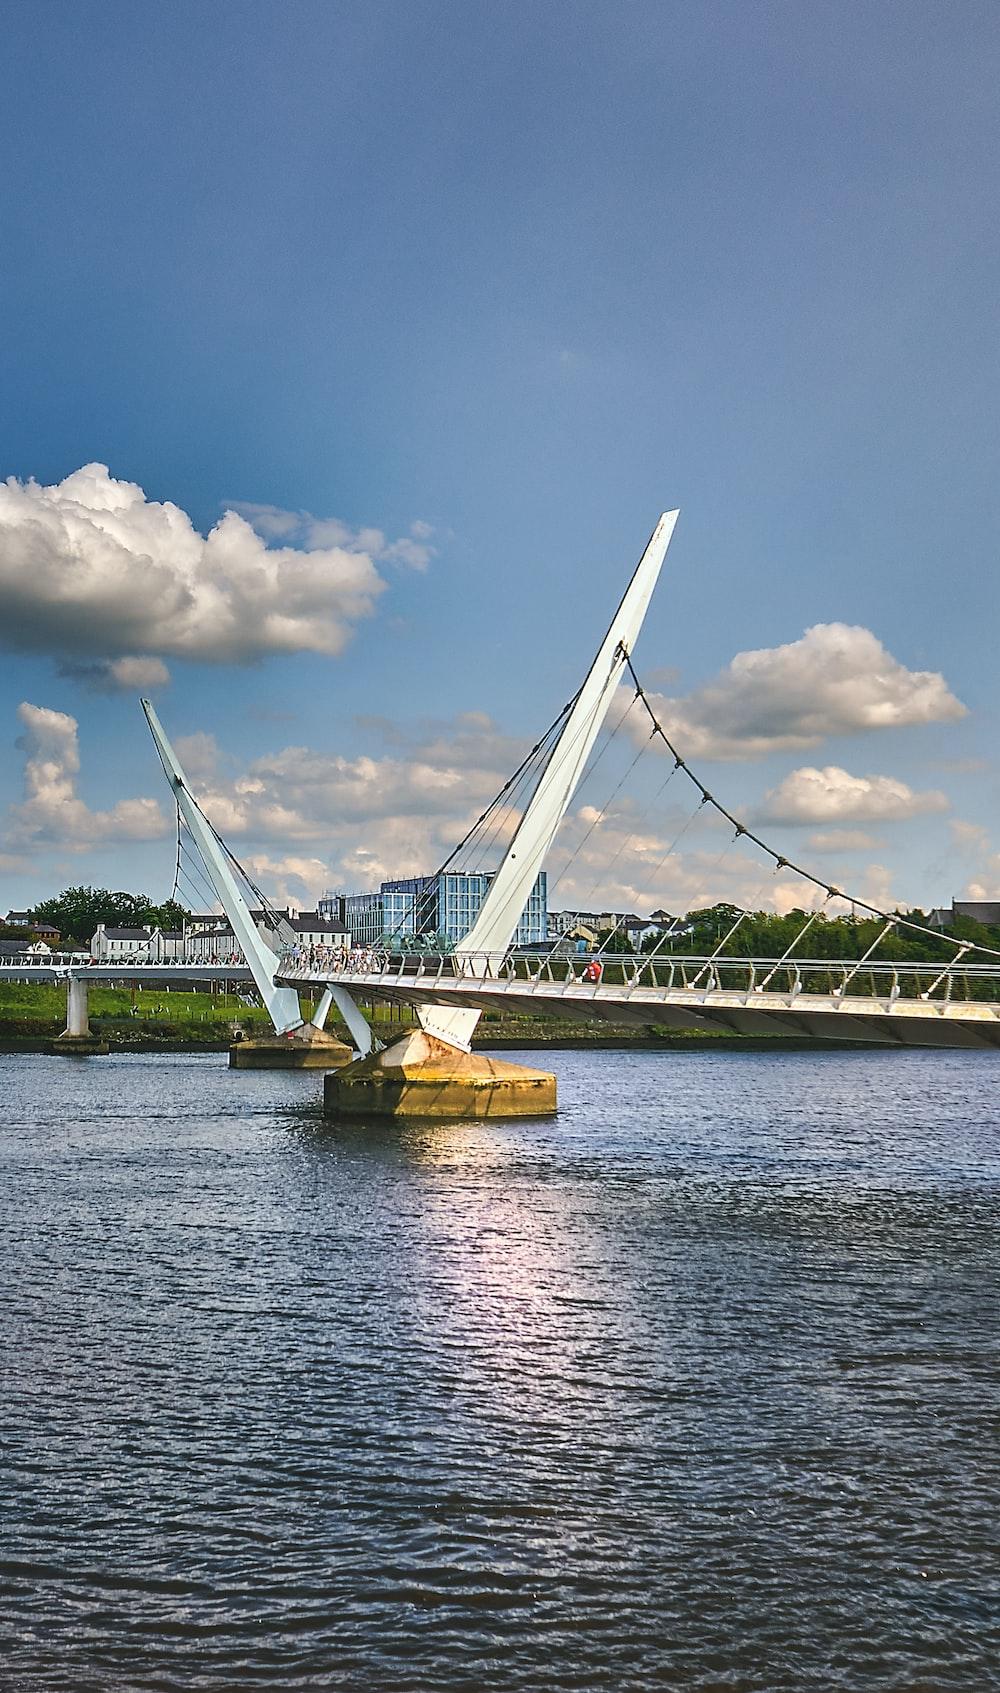 white bridge over body of water under blue sky during daytime